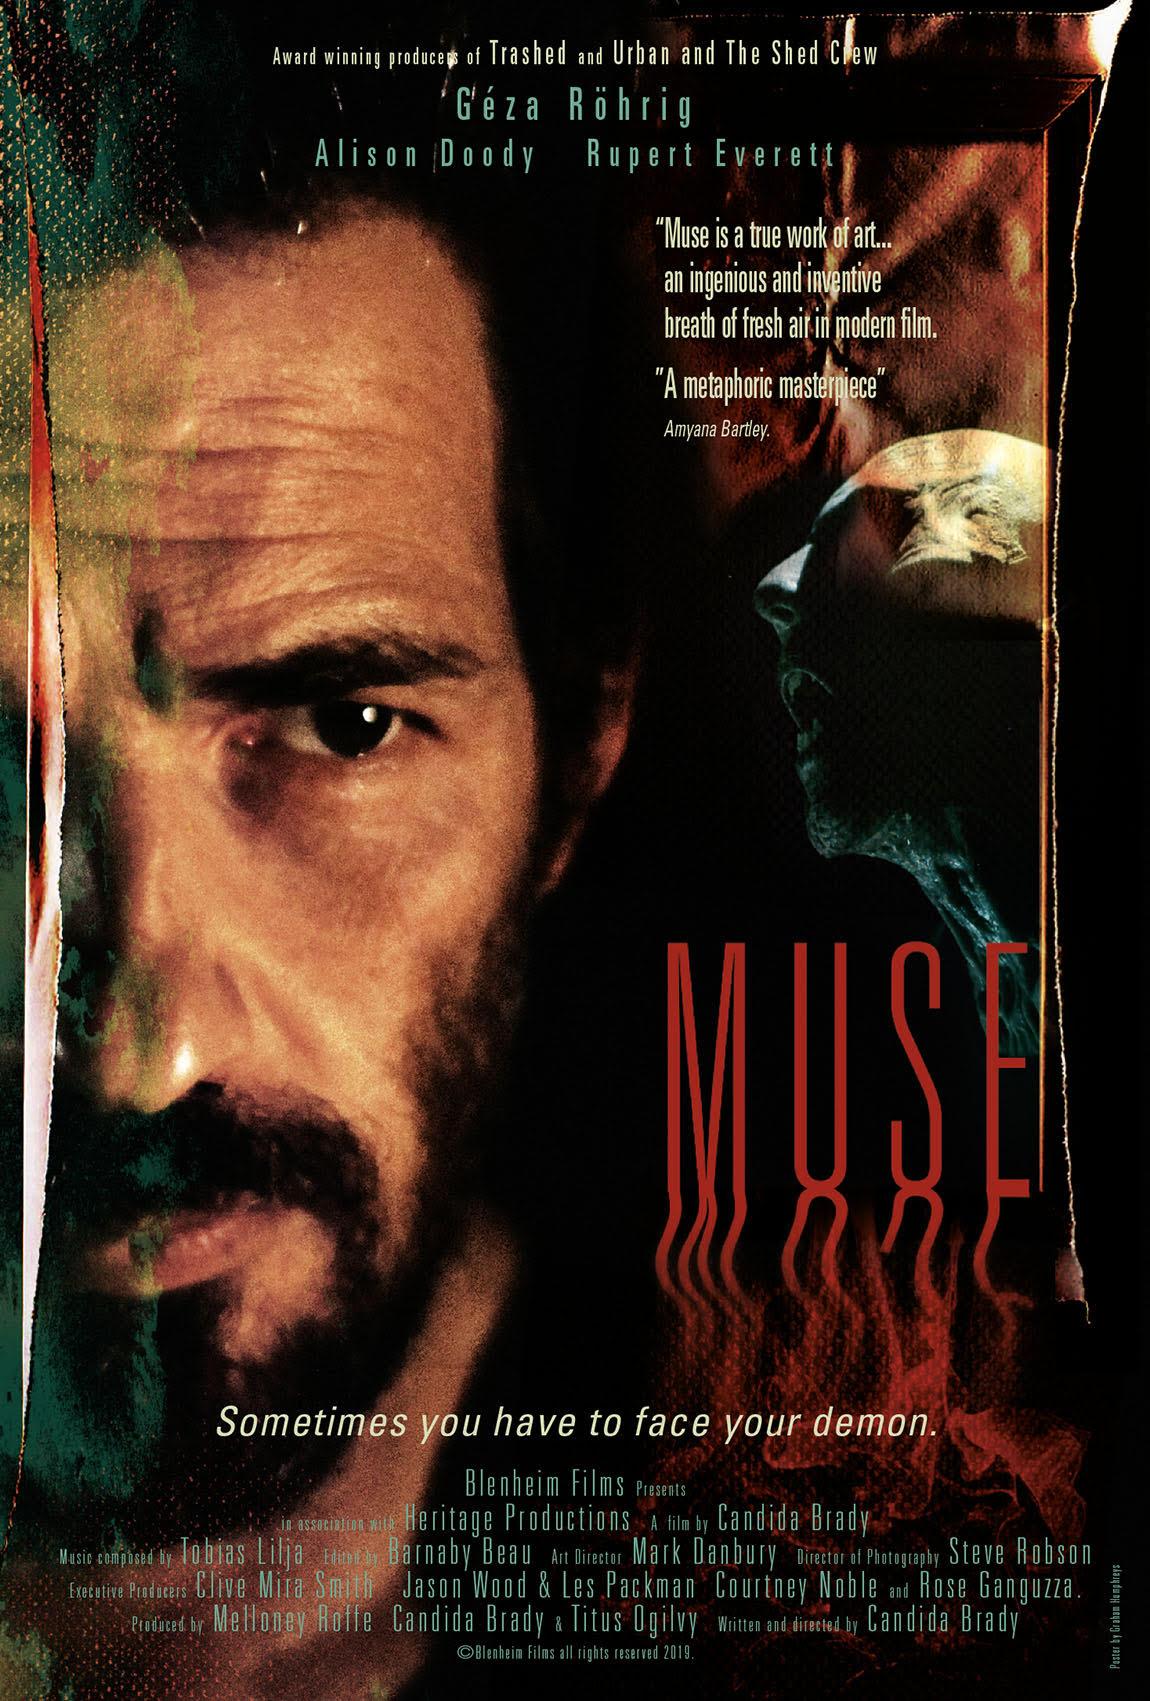 Muse film starring Géza Röhrig Poster